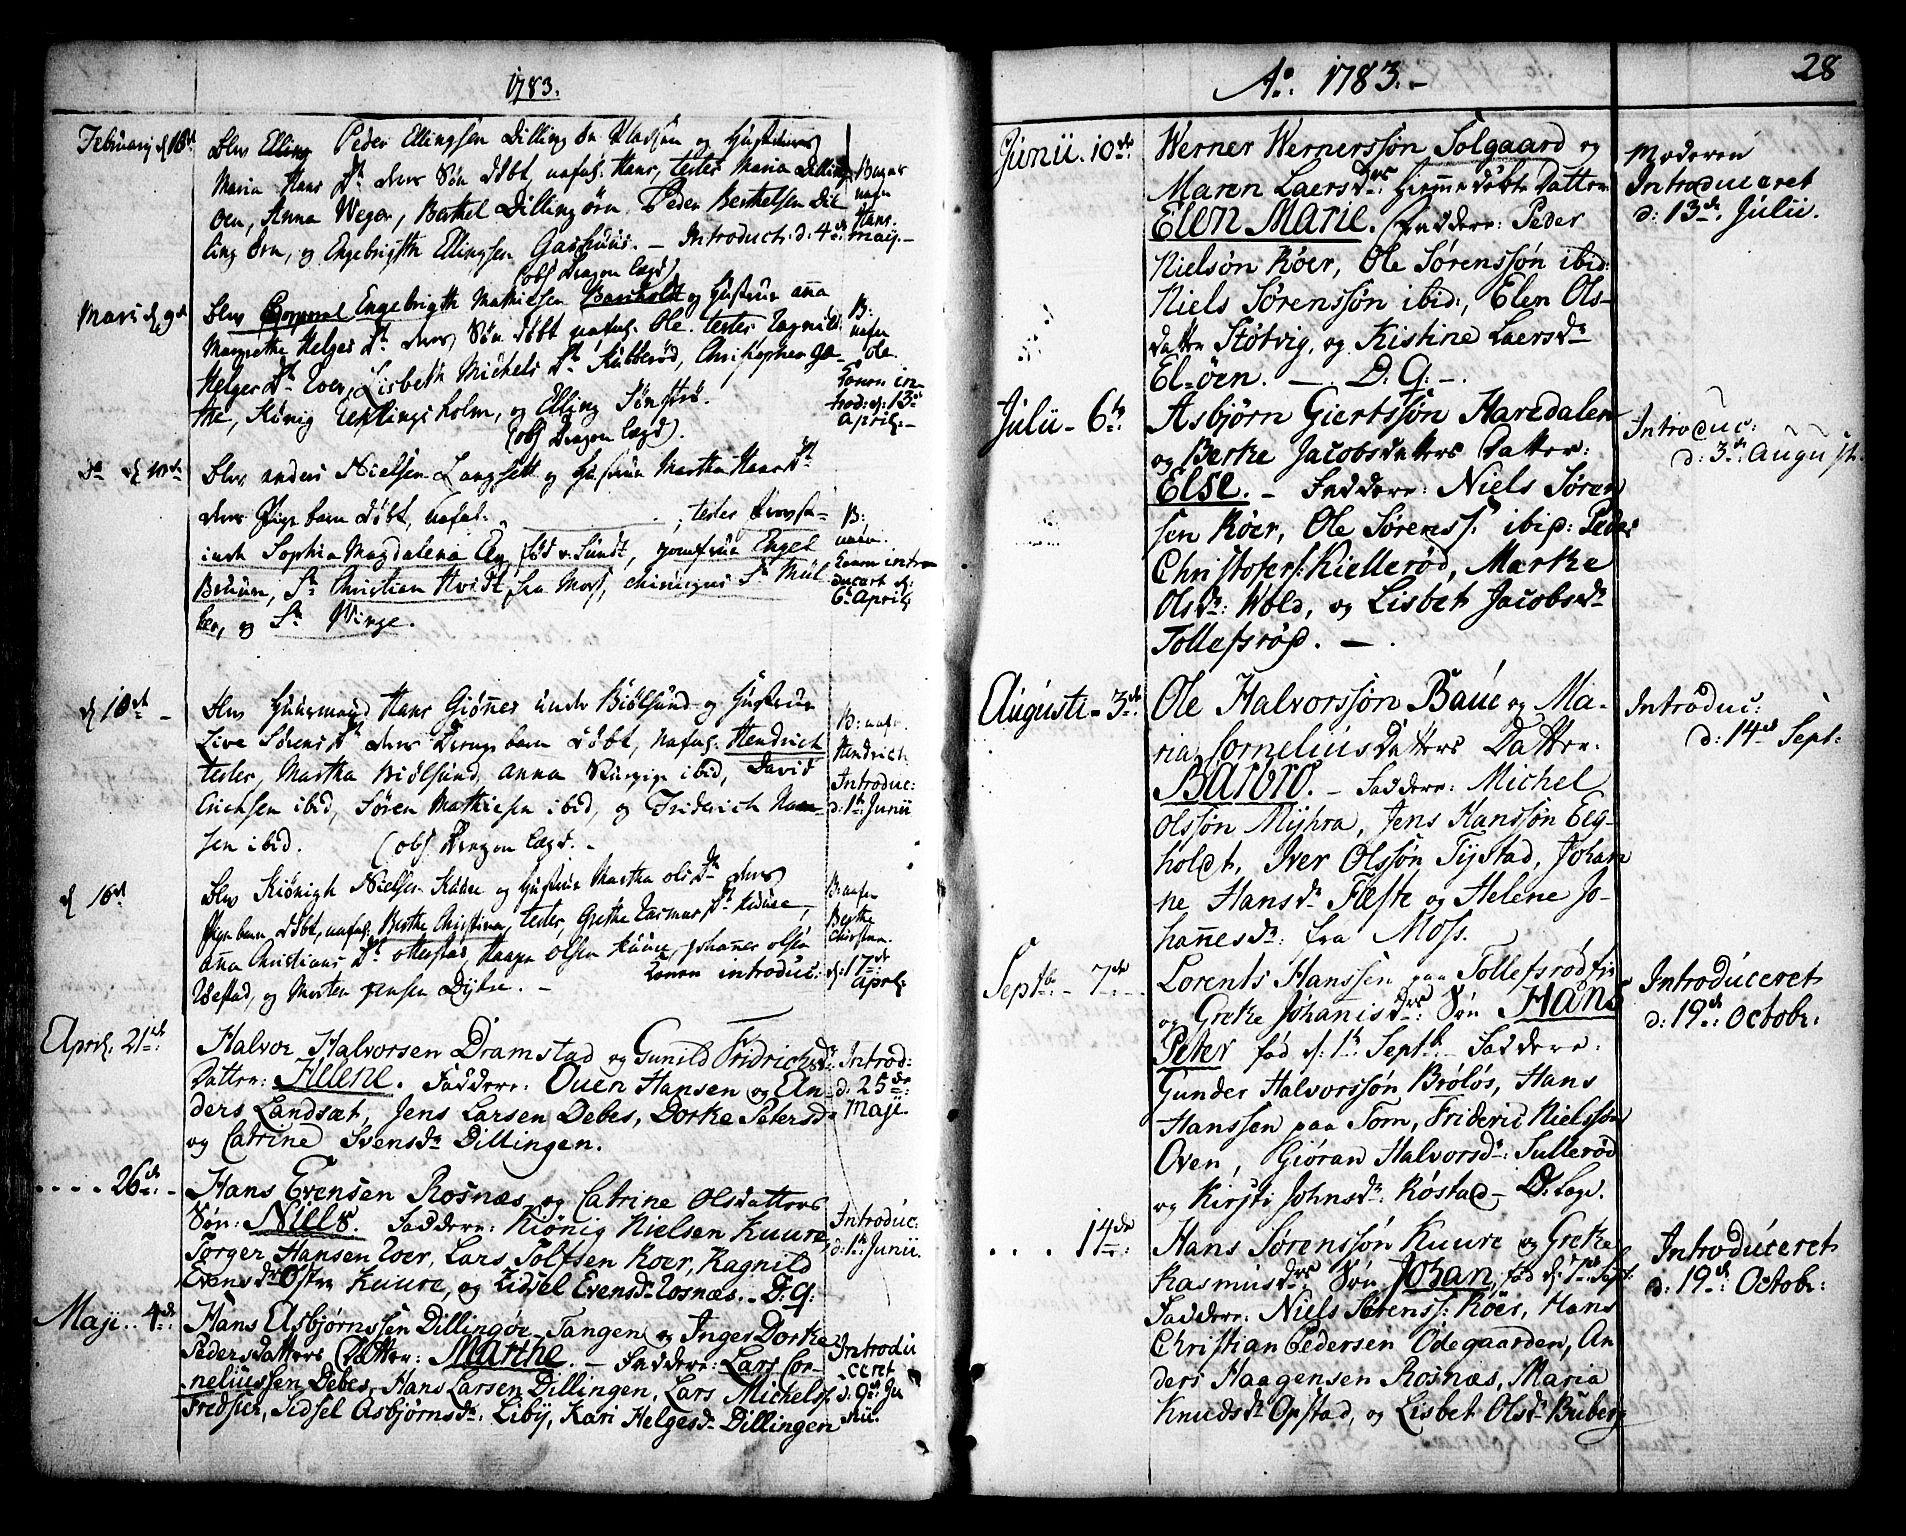 SAO, Rygge prestekontor Kirkebøker, F/Fa/L0002: Parish register (official) no. 2, 1771-1814, p. 28